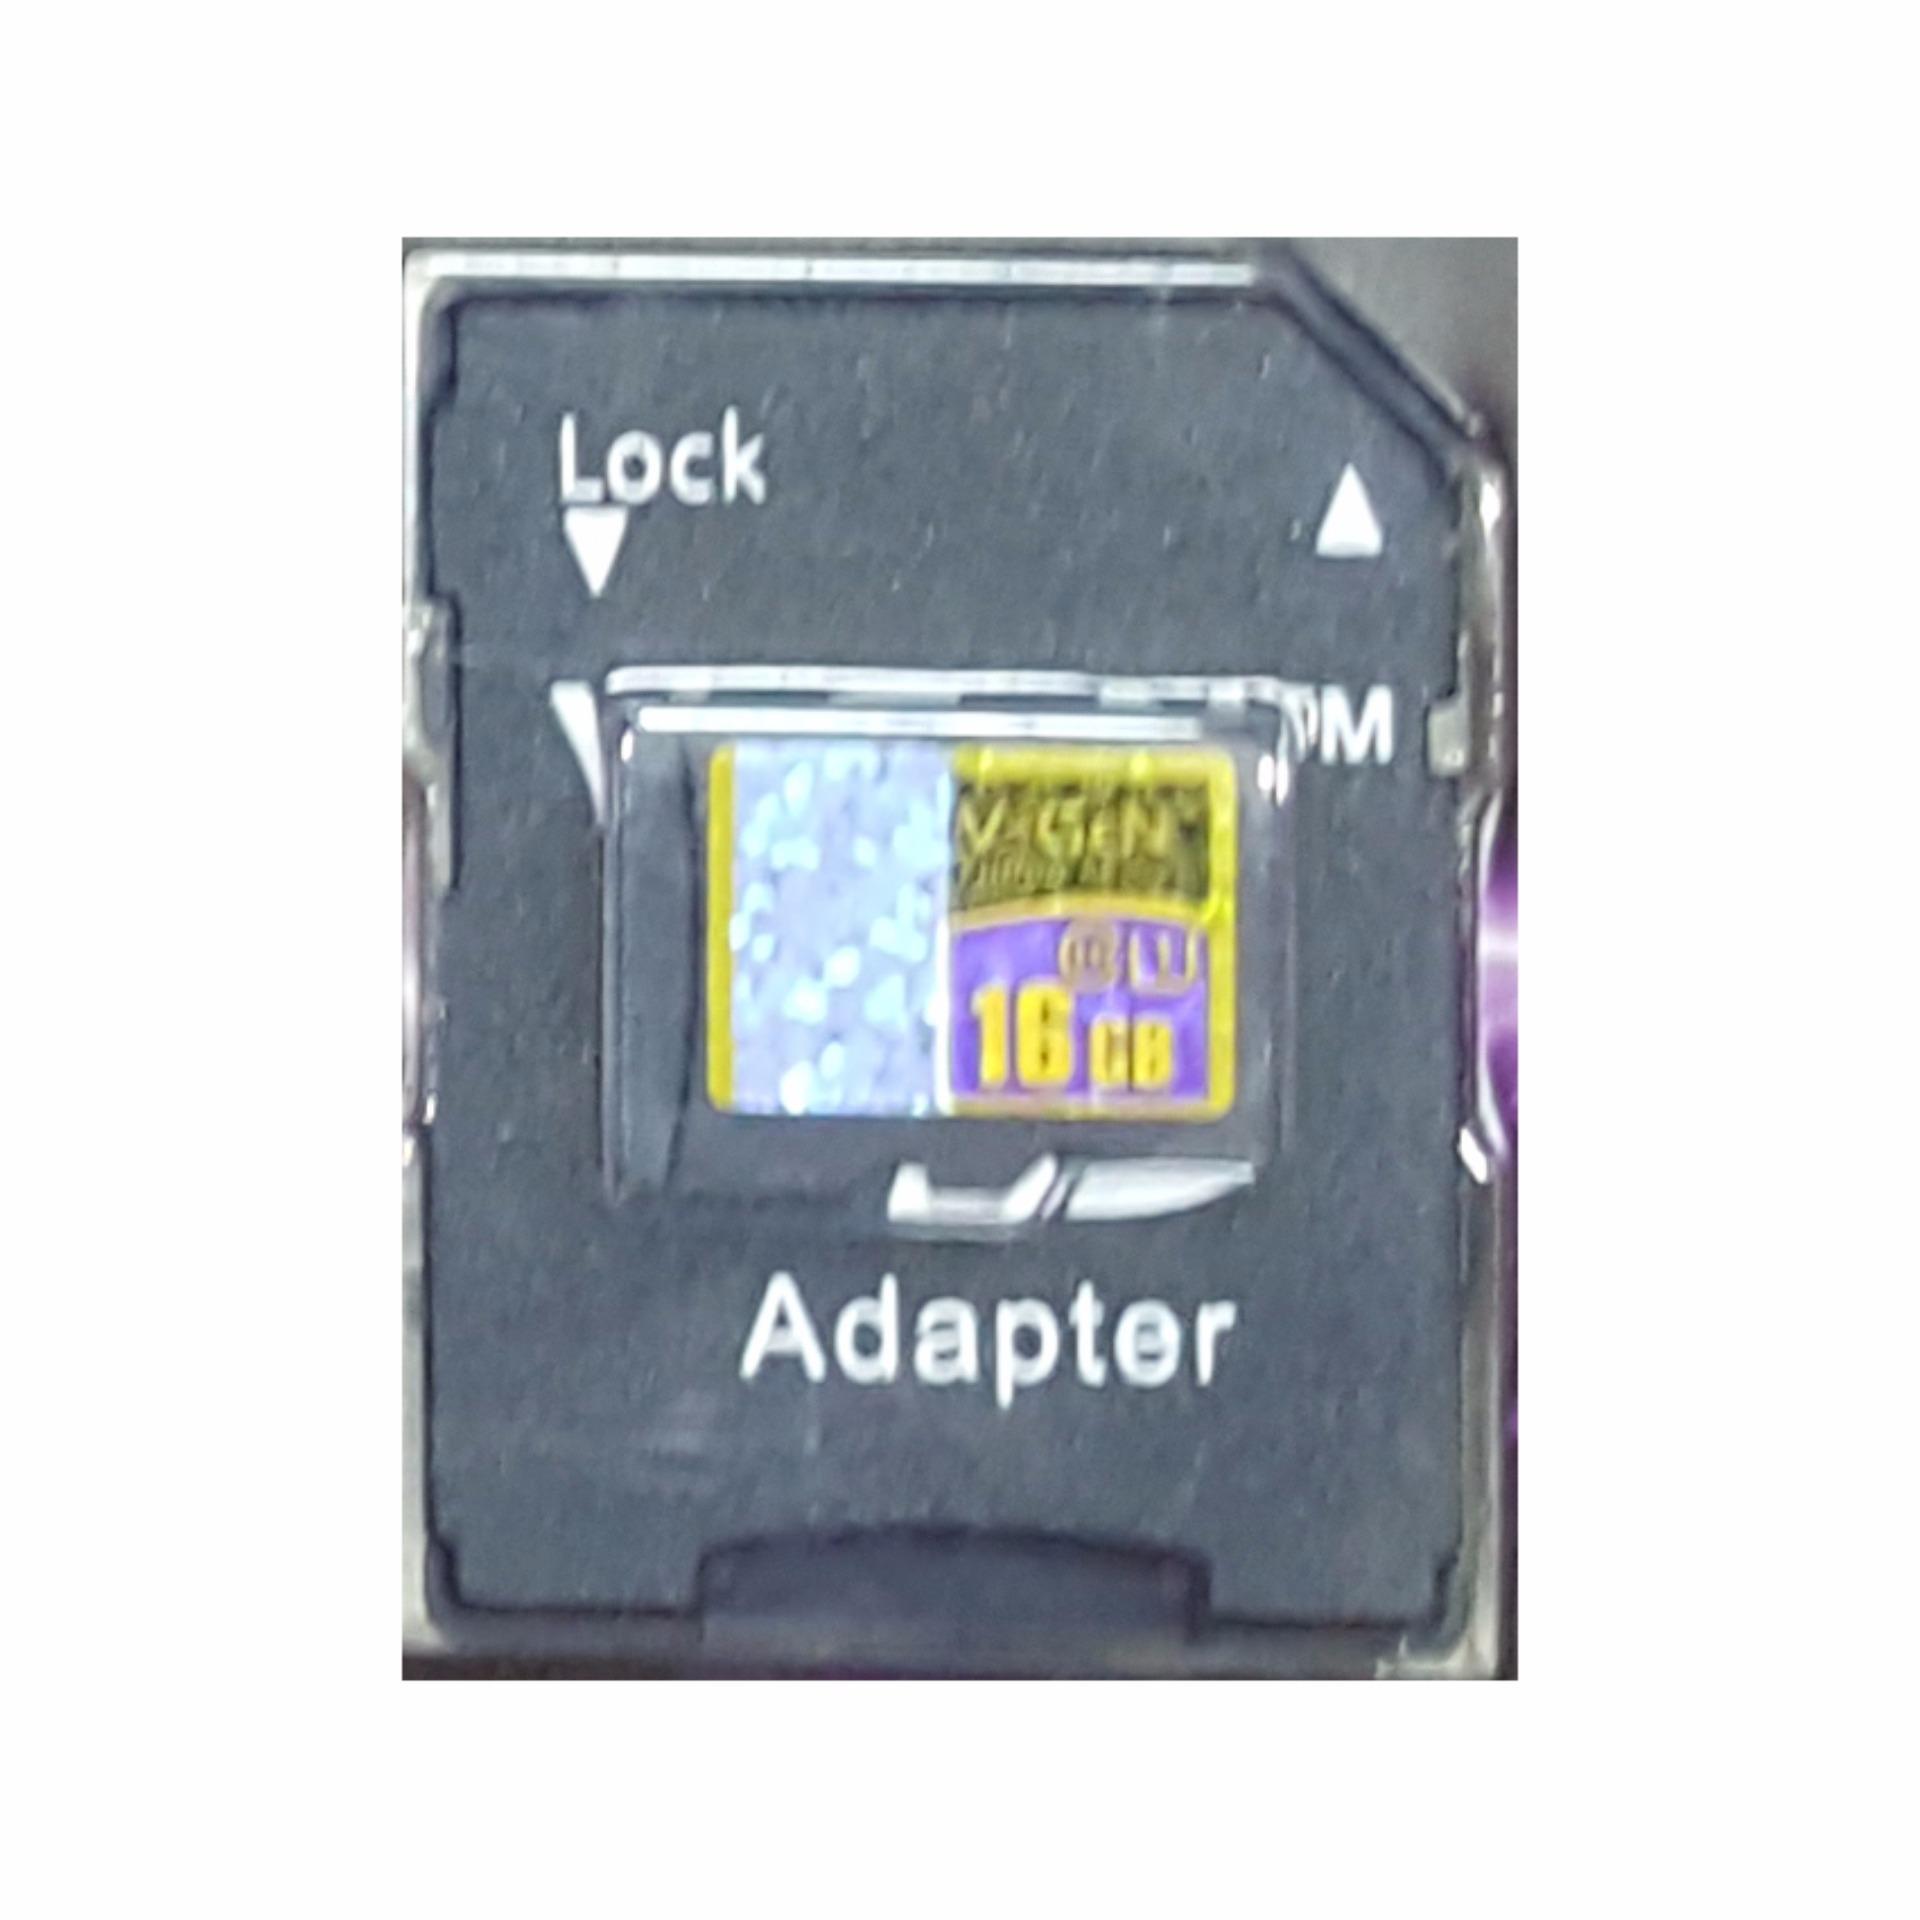 Microsd V Gen 8gb Class 6 48mb S Vgen Memory Hp Daftar Maestro 10 52mb Turbo 16gb Adapter 85mb